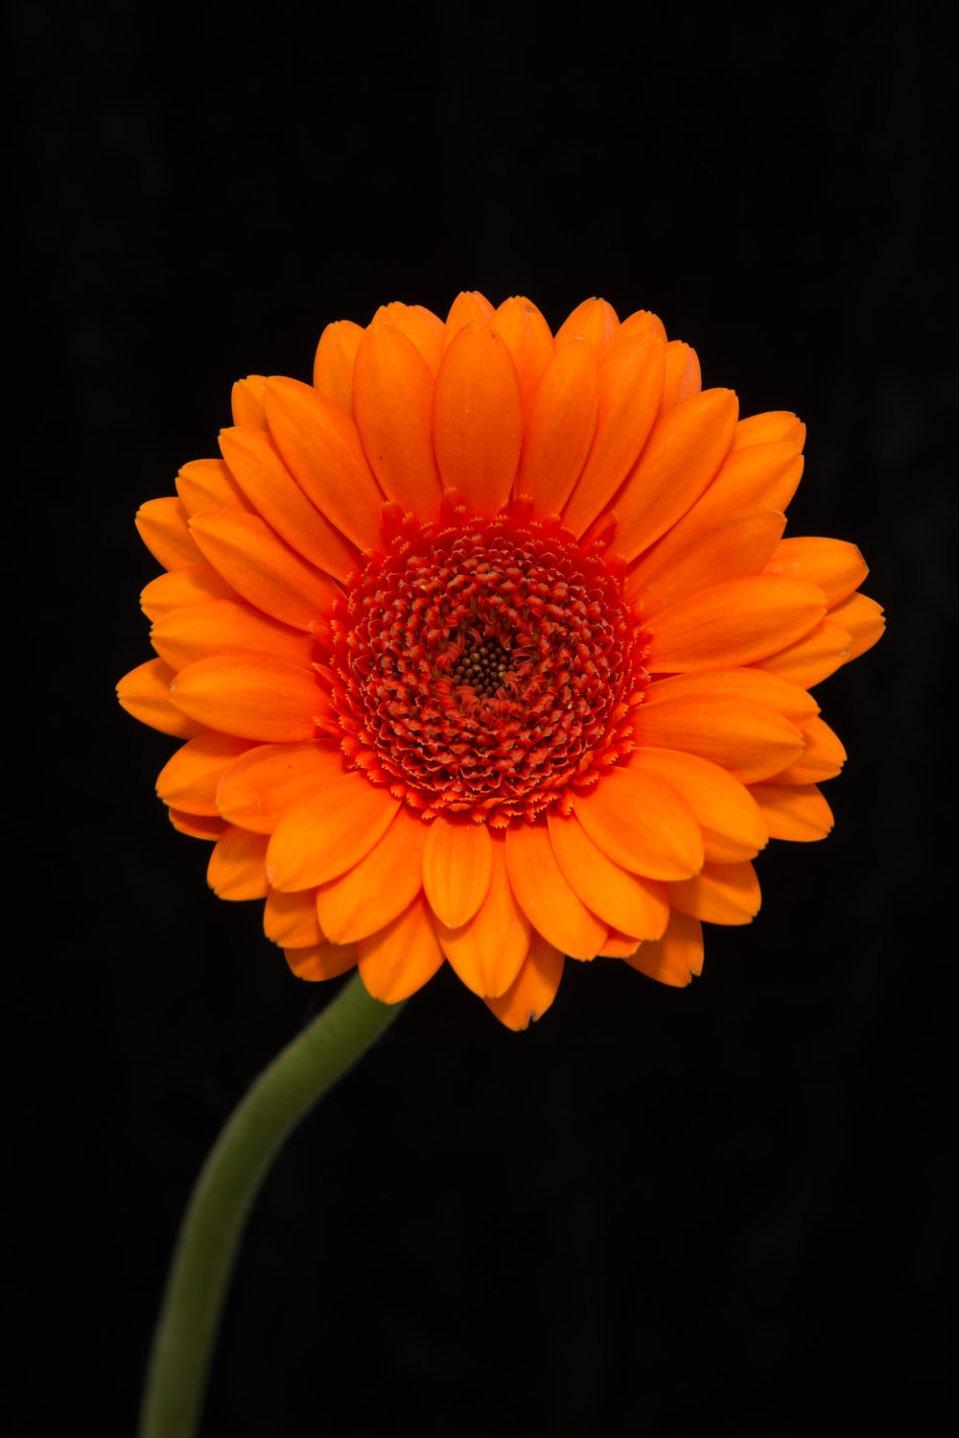 Head and stem of bright orange gerbera